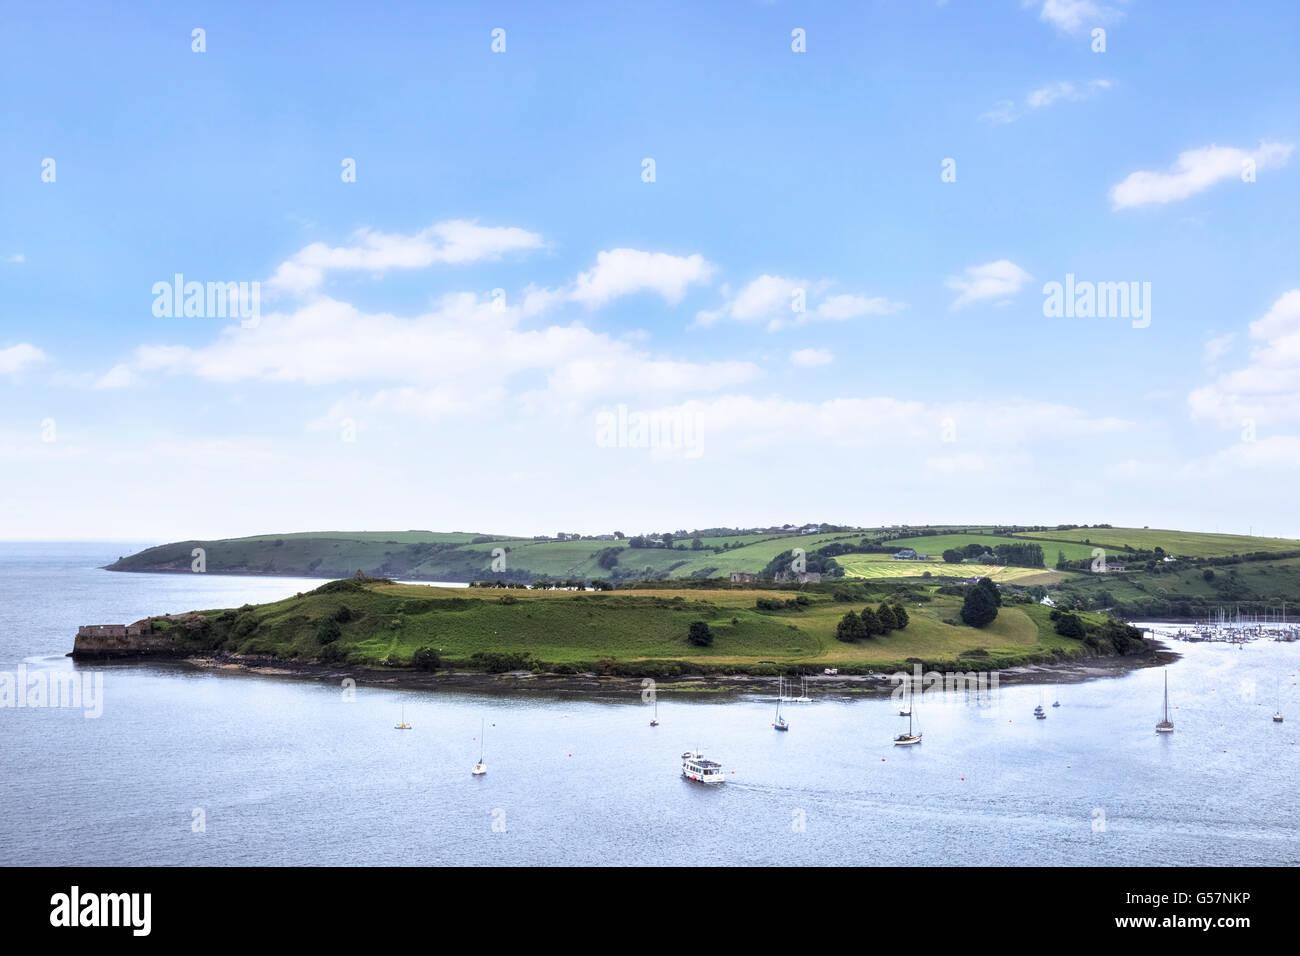 Castlepark Peninsula, James Fort, Kinsale, County Cork, Ireland - Stock Image